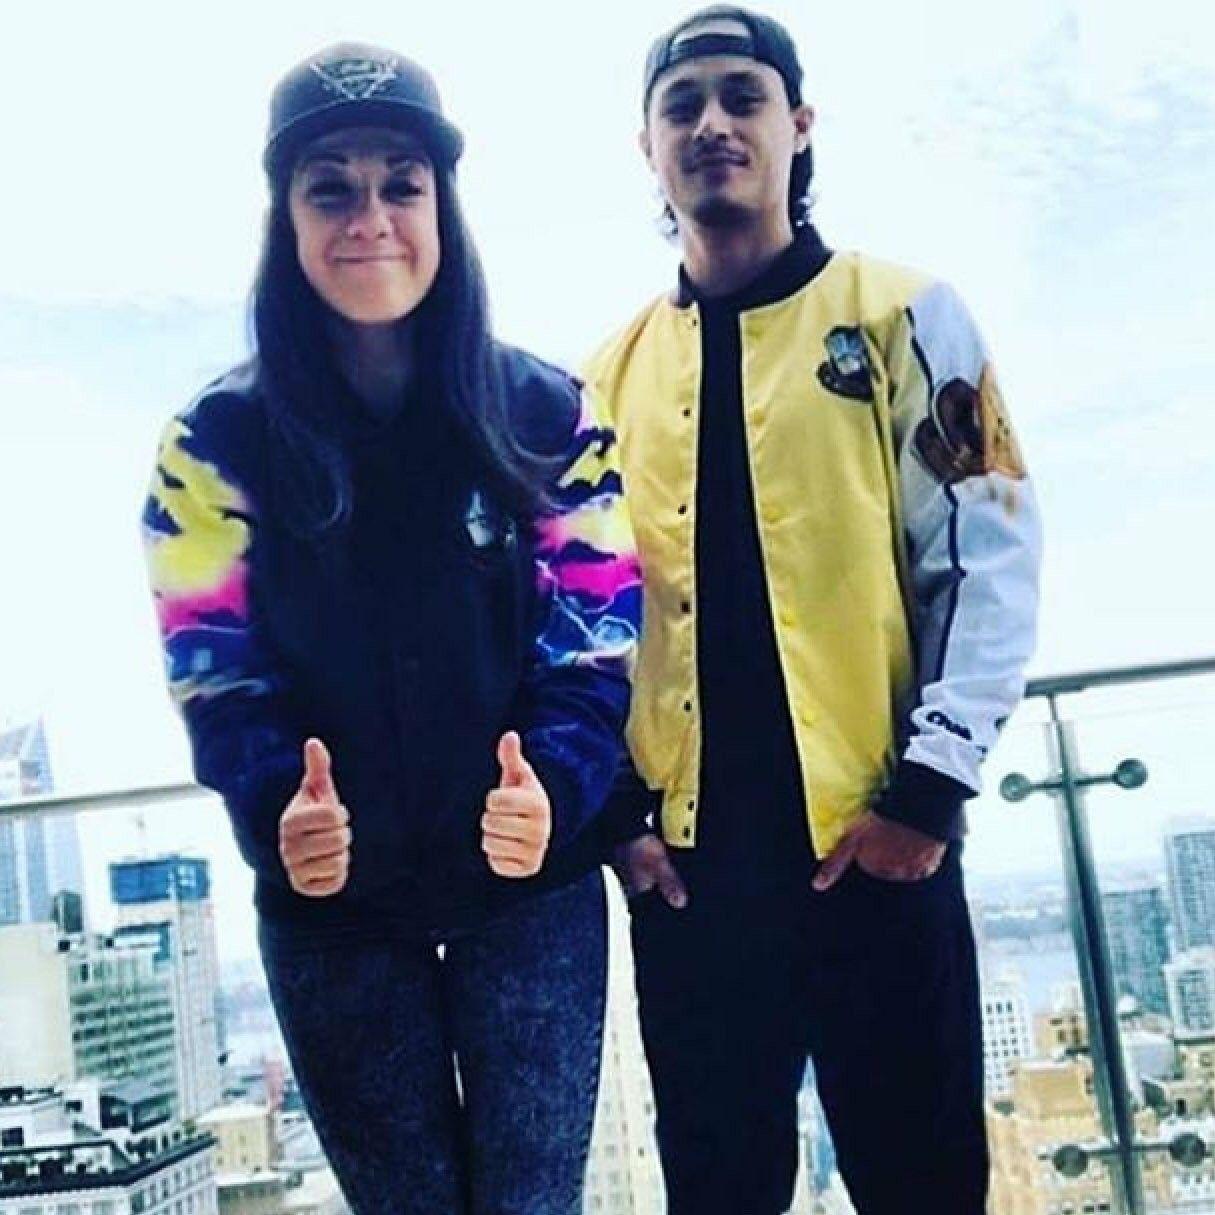 Wwe Superstar Bayley Pamela Martinez With Her Fiance Aaron Solow